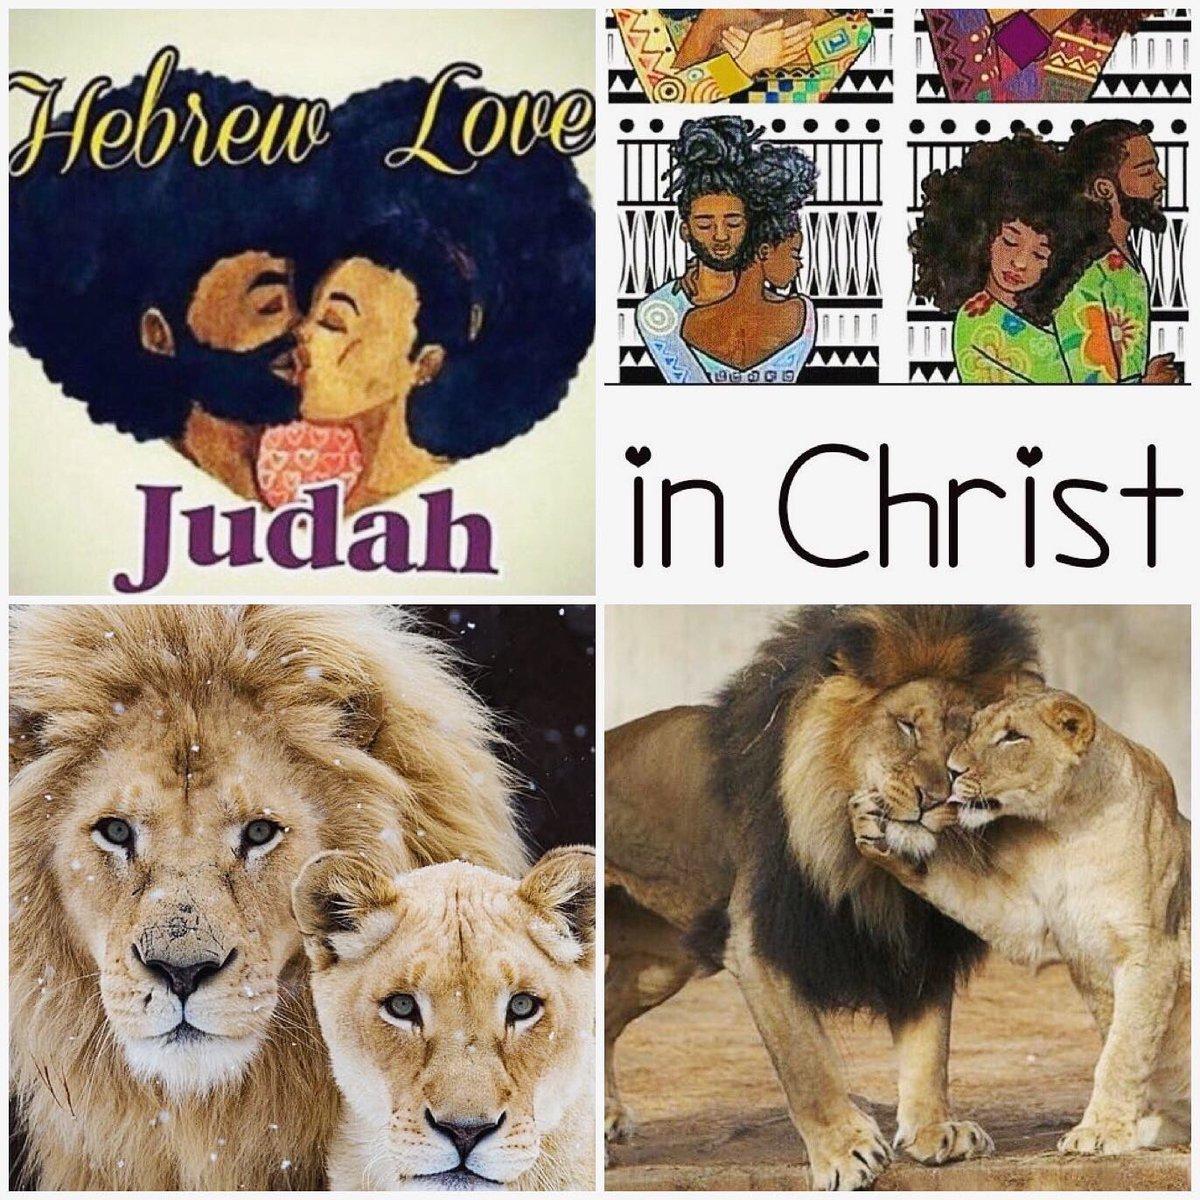 #HebrewLove #Judah #OneInChrist #Yahawashai #Yahawah #OneLove #DivineOrder #Righteousness #TheWayItShouldBeDone #Head #Rib #Alpha #Lioness #NeedMine #Patience #Meek #Humble #Modest #Powerfulpic.twitter.com/dEg8Rhxokq